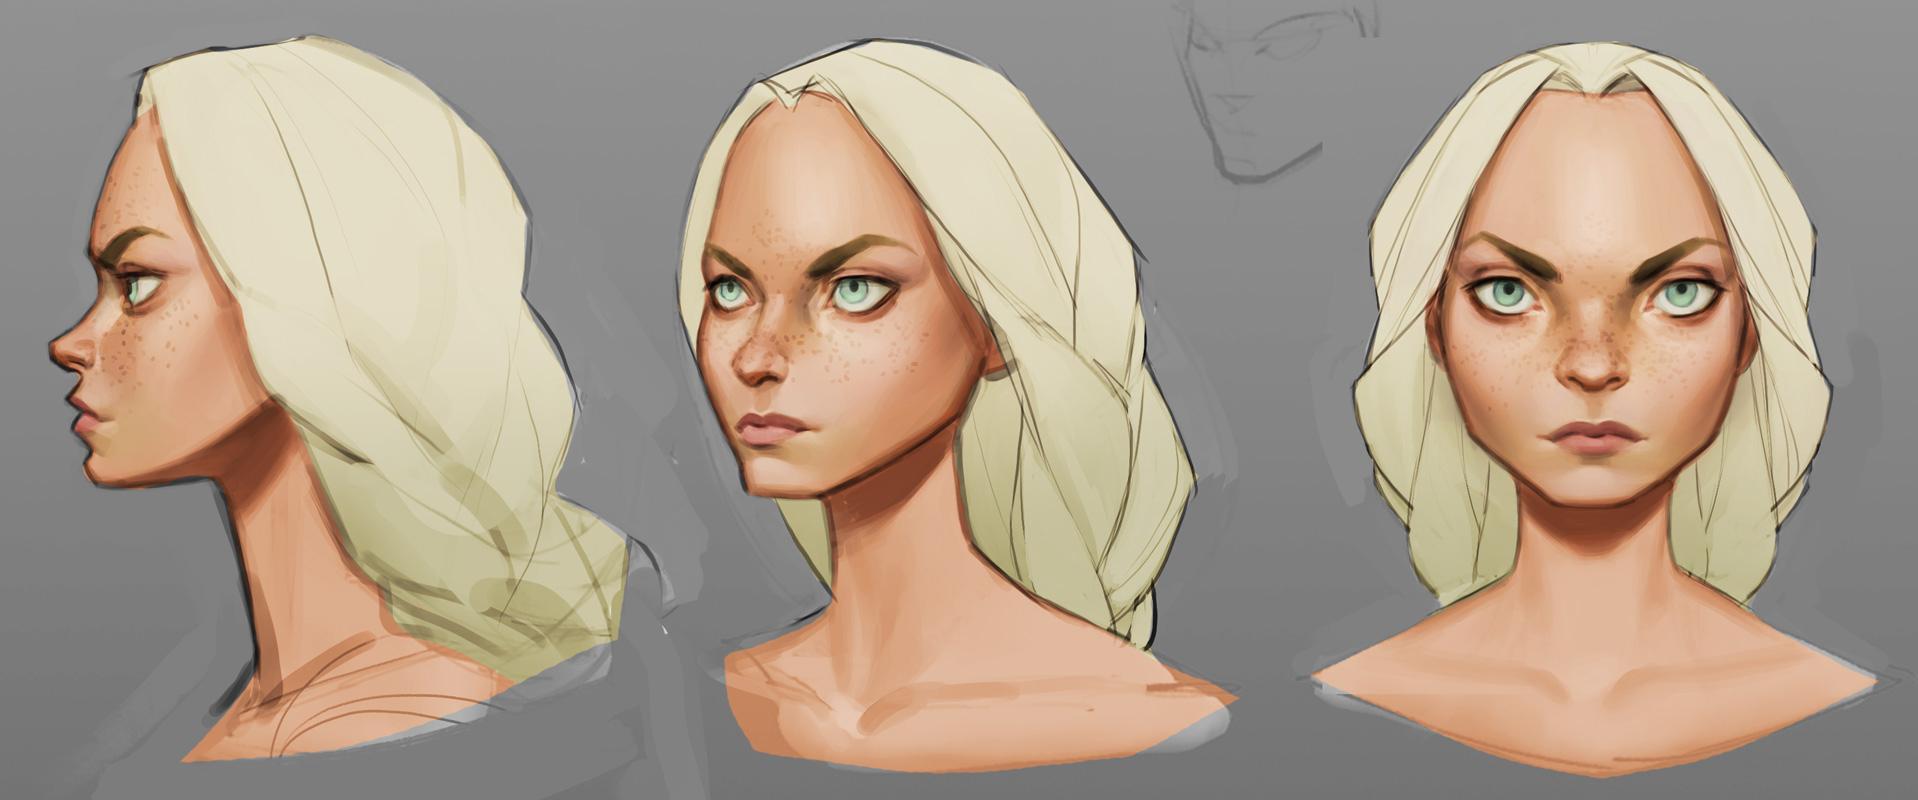 Evienne's final face design